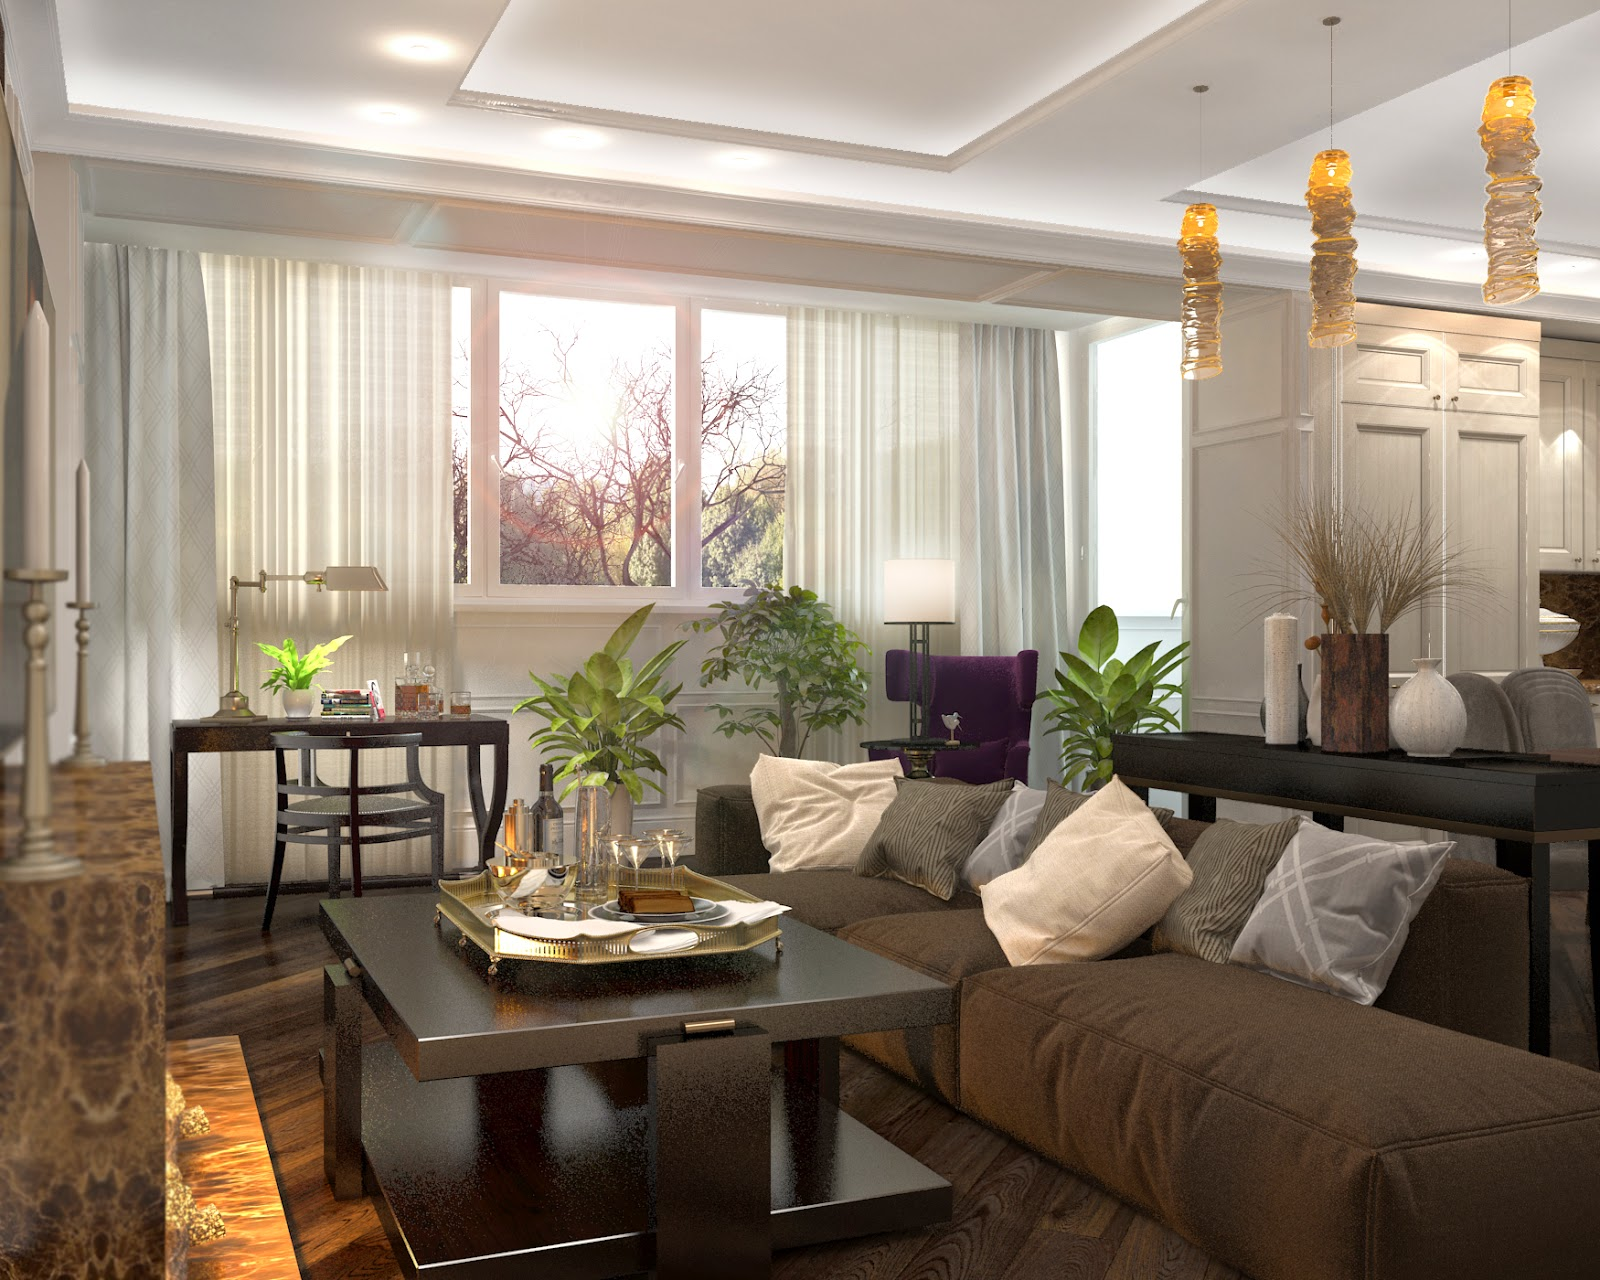 Darya girina interior design march 2015 - Bedroom